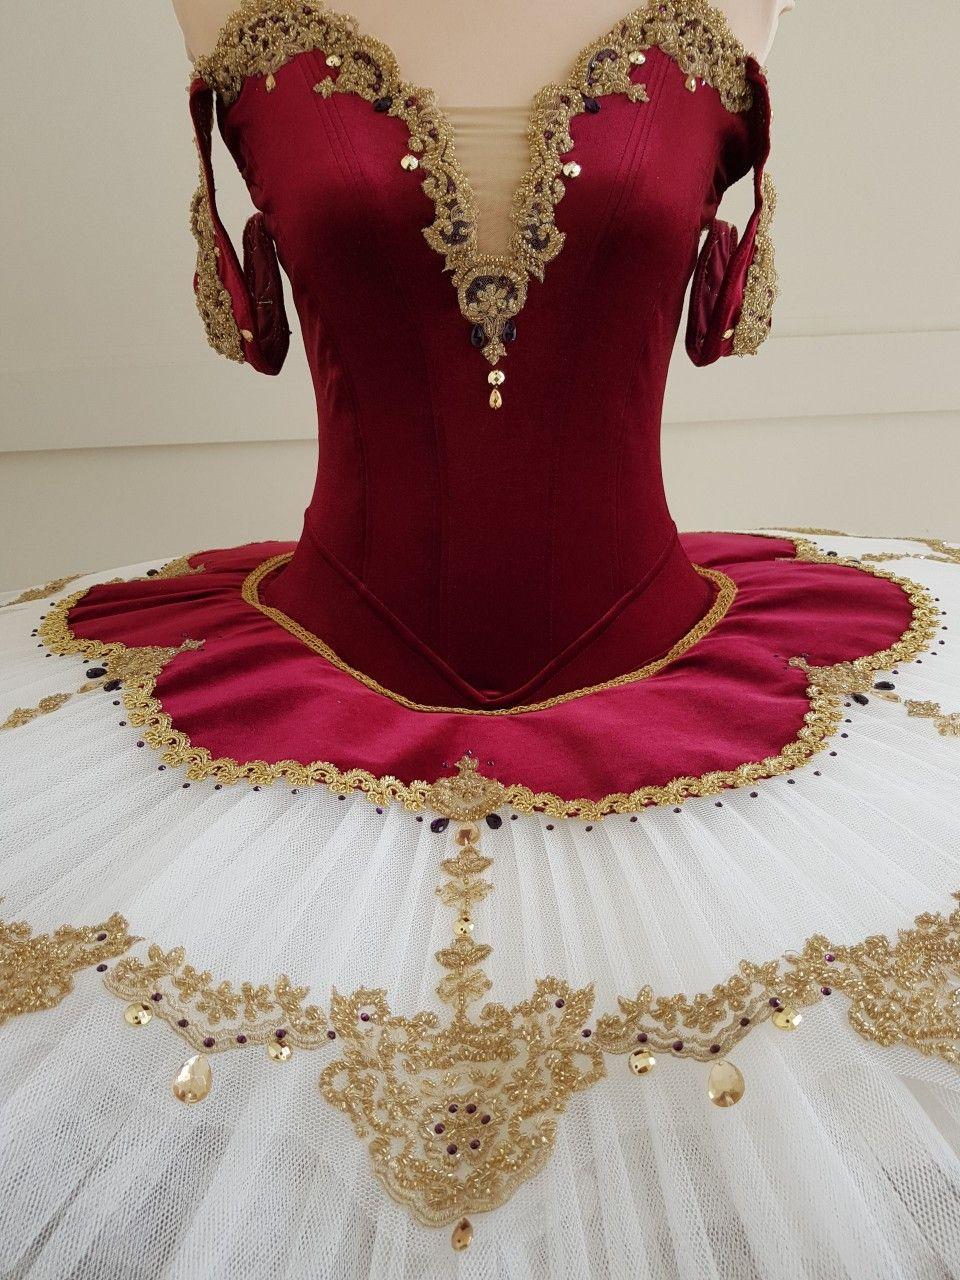 Gorgeous Wine Ivory Tutu With Gold Decorations Www Jetutus Com Au Tutu Costumes Classical Ballet Tutu Dance Costumes Ballet